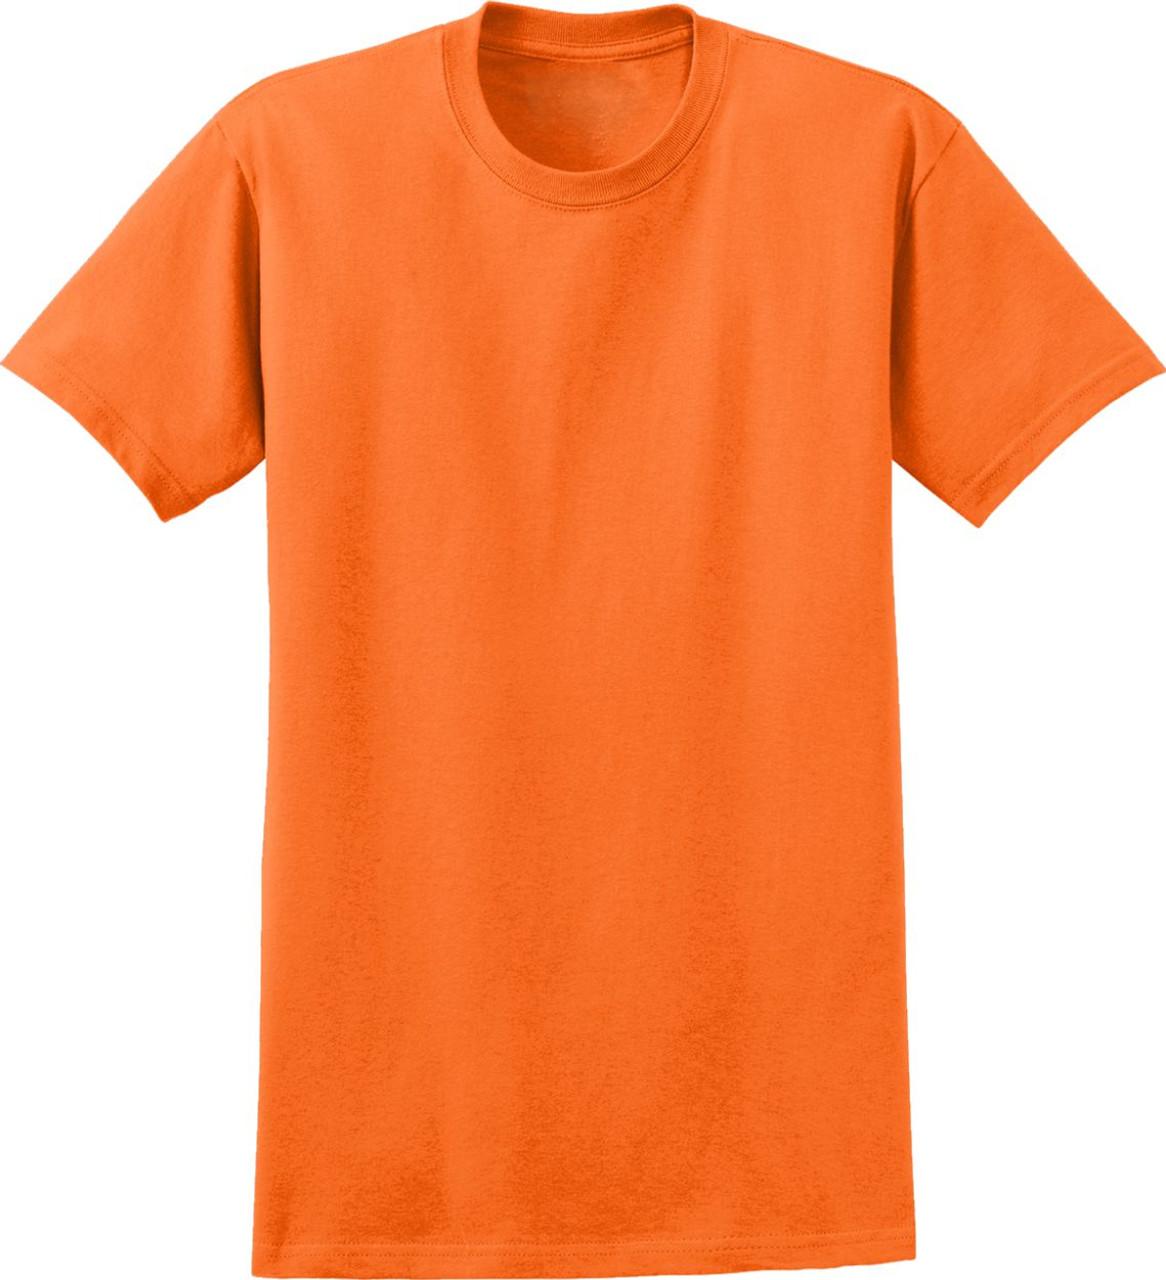 Safety Orange TShirt | Hi Vis Work Shirt